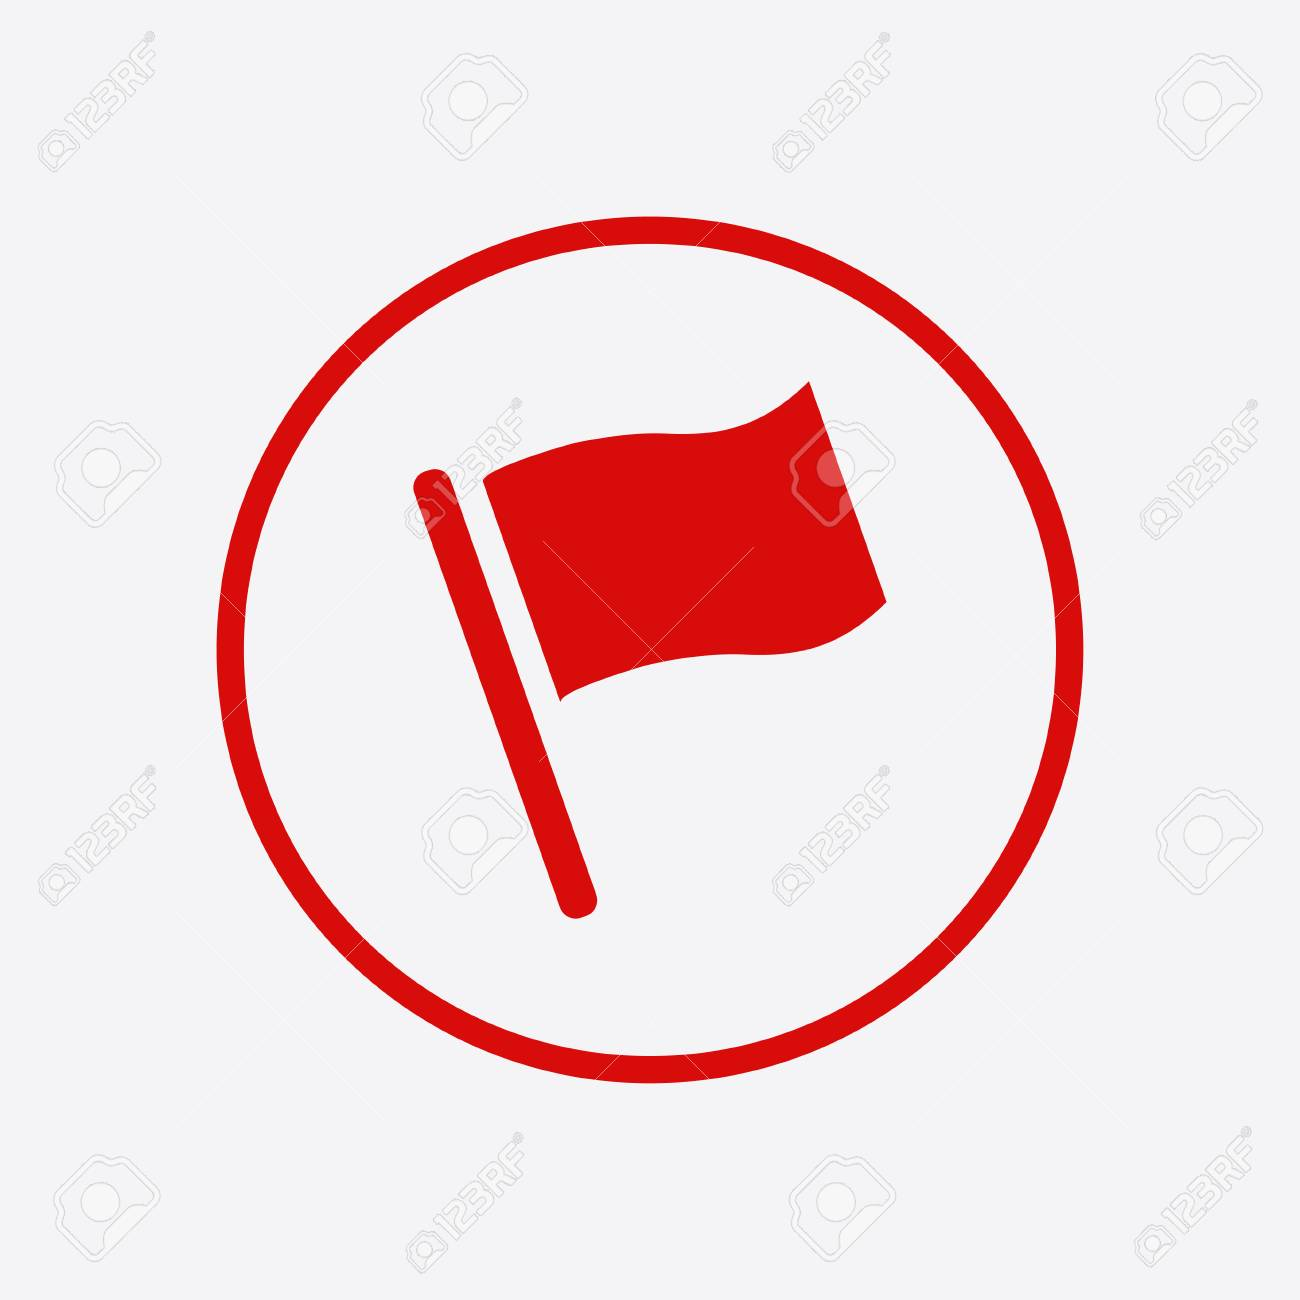 Flag icon  Location marker symbol  Flat design style